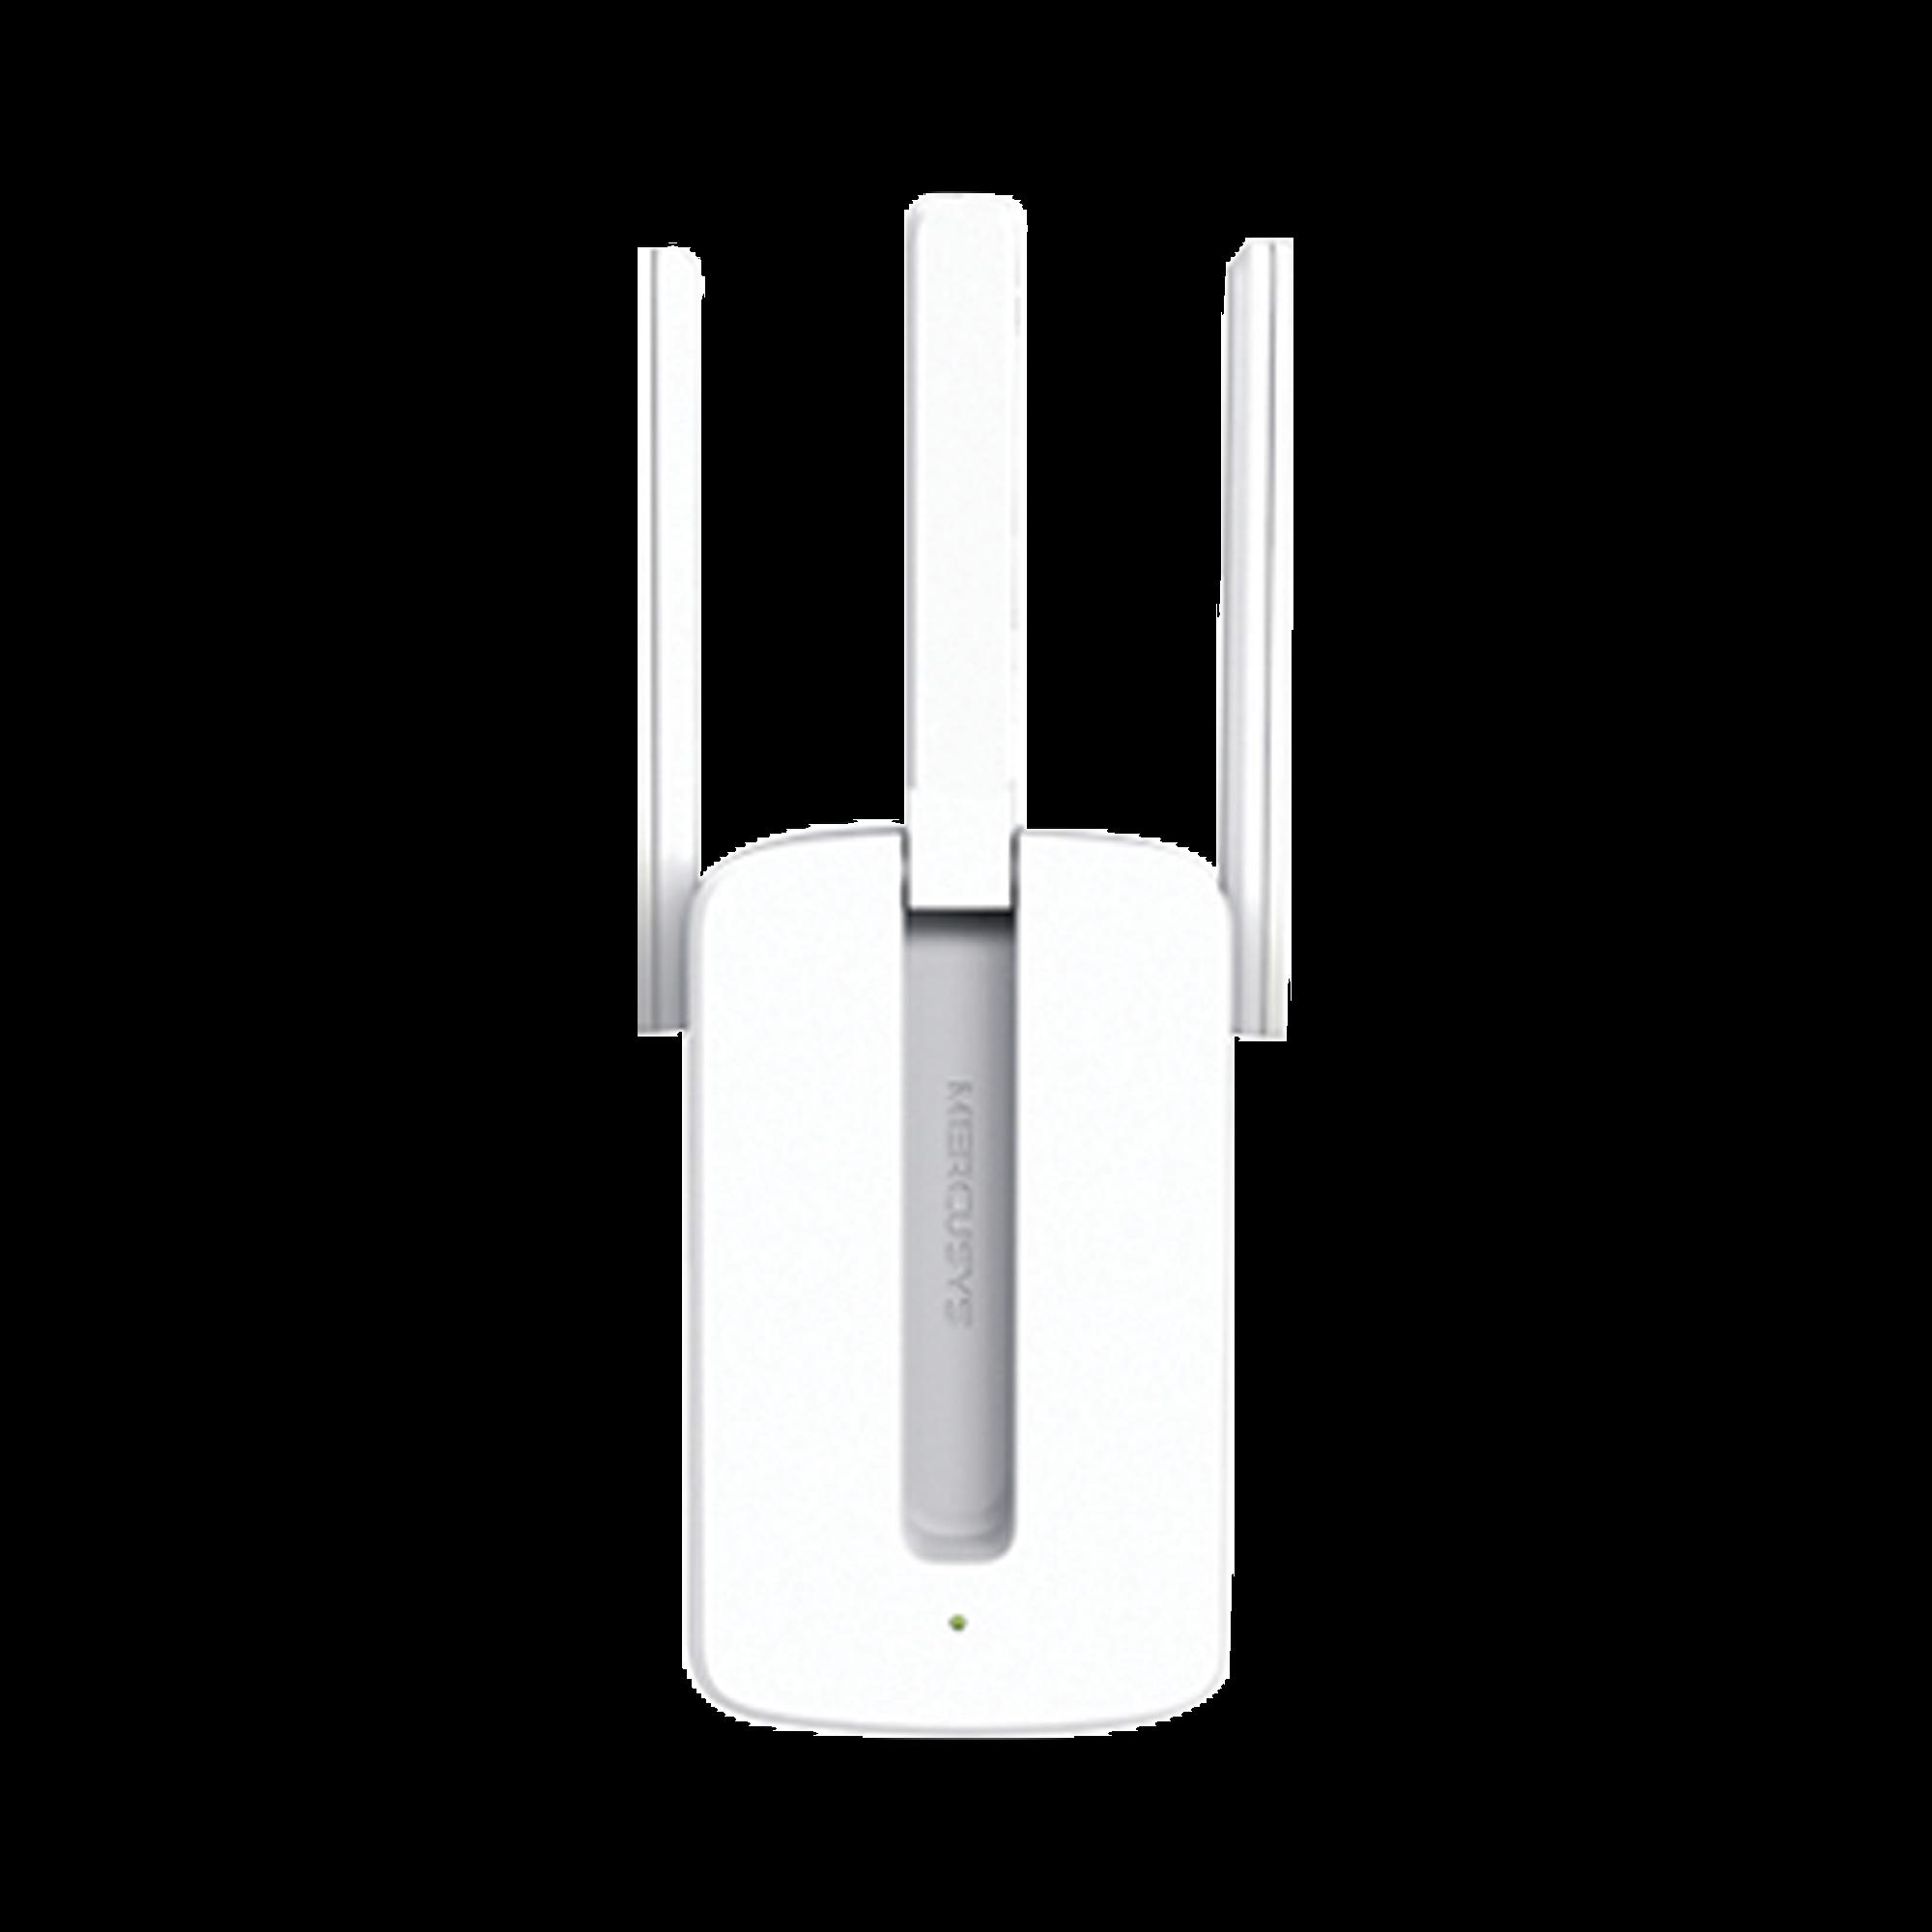 Repetidor / Extensor de Cobertura WiFi N, 300 Mbps, 2.4 GHz y 3 antenas externas.